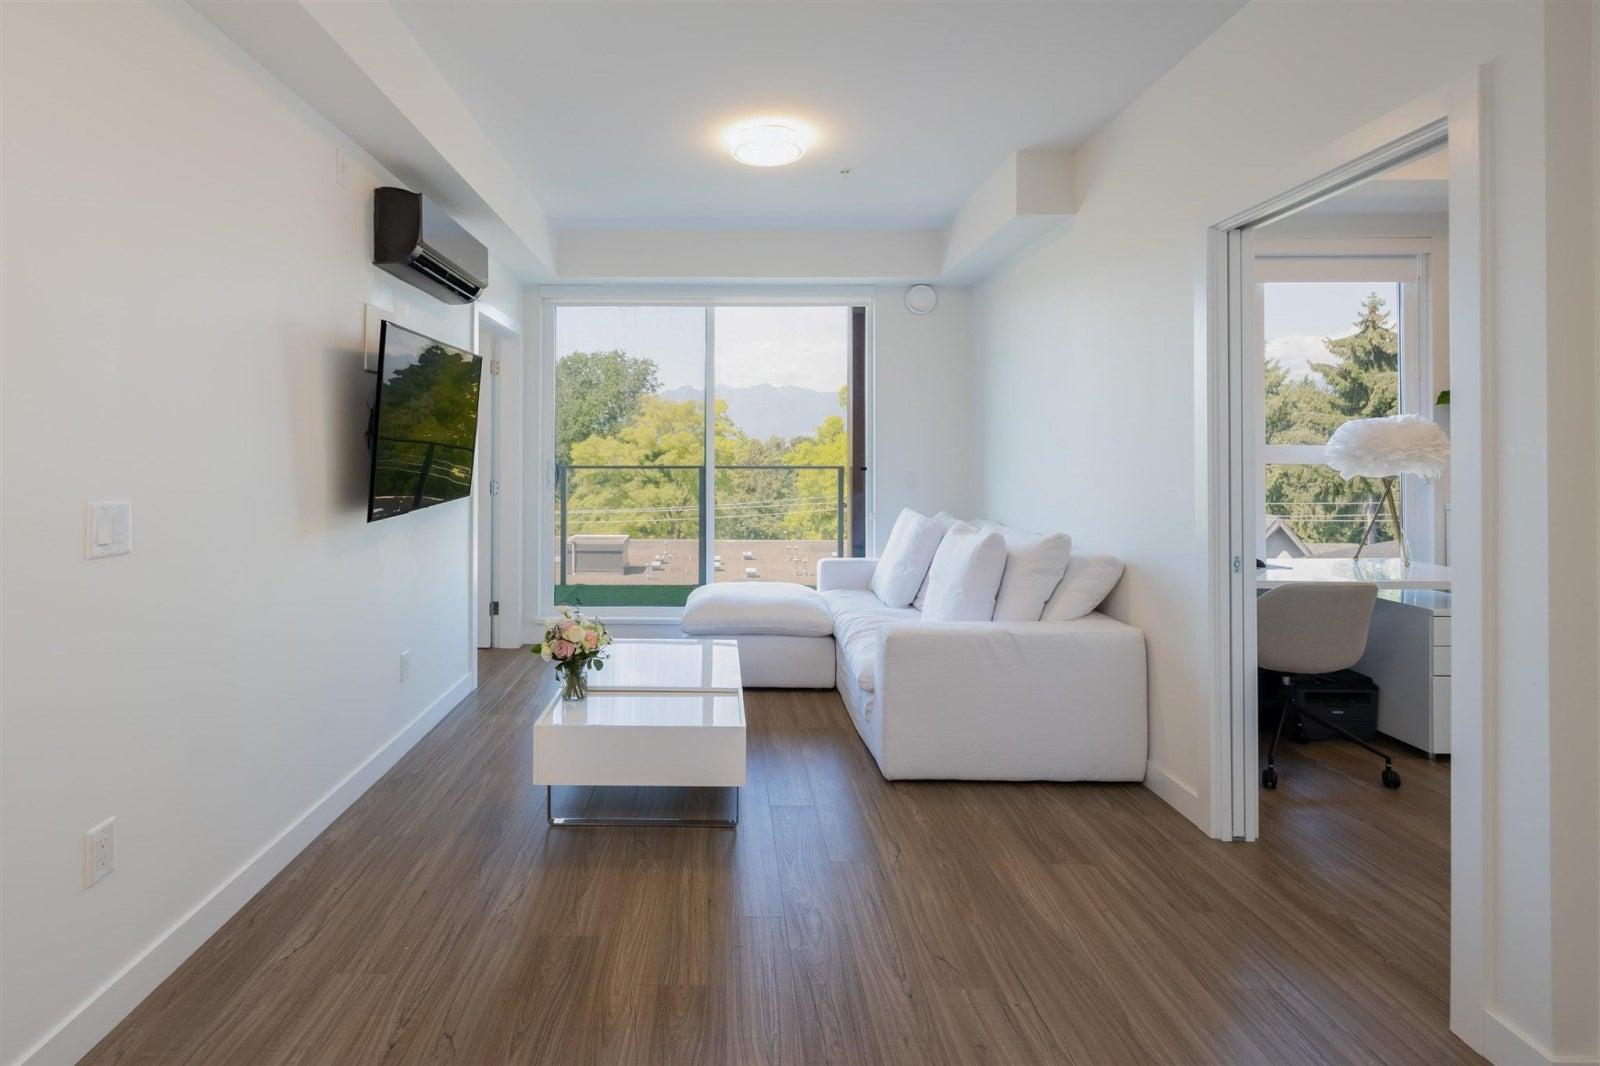 408 379 E BROADWAY AVENUE - Mount Pleasant VE Apartment/Condo for sale, 2 Bedrooms (R2599900) #7